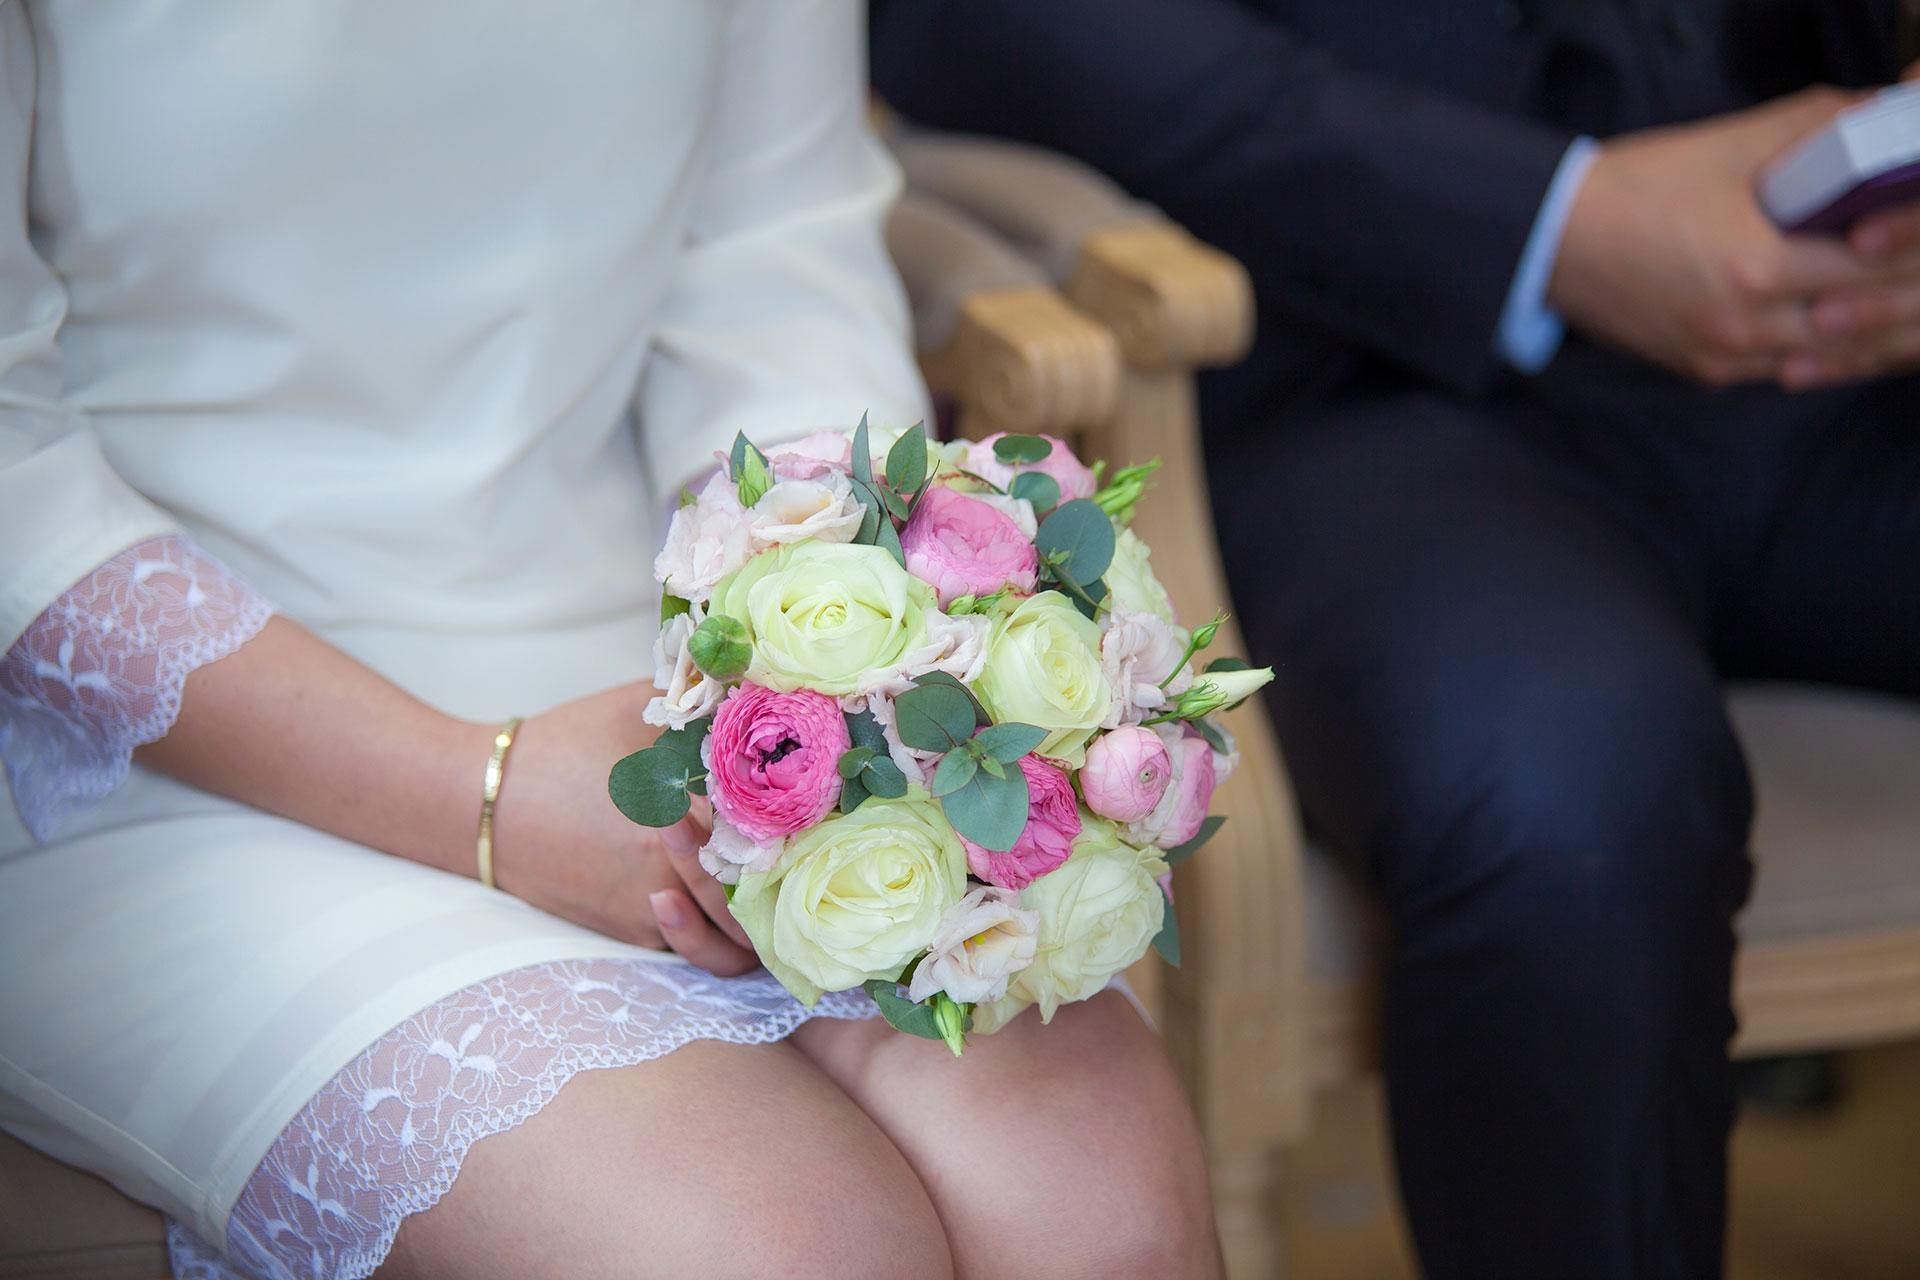 particuliers-evenements-mariages-oui-zelie&valentin-10